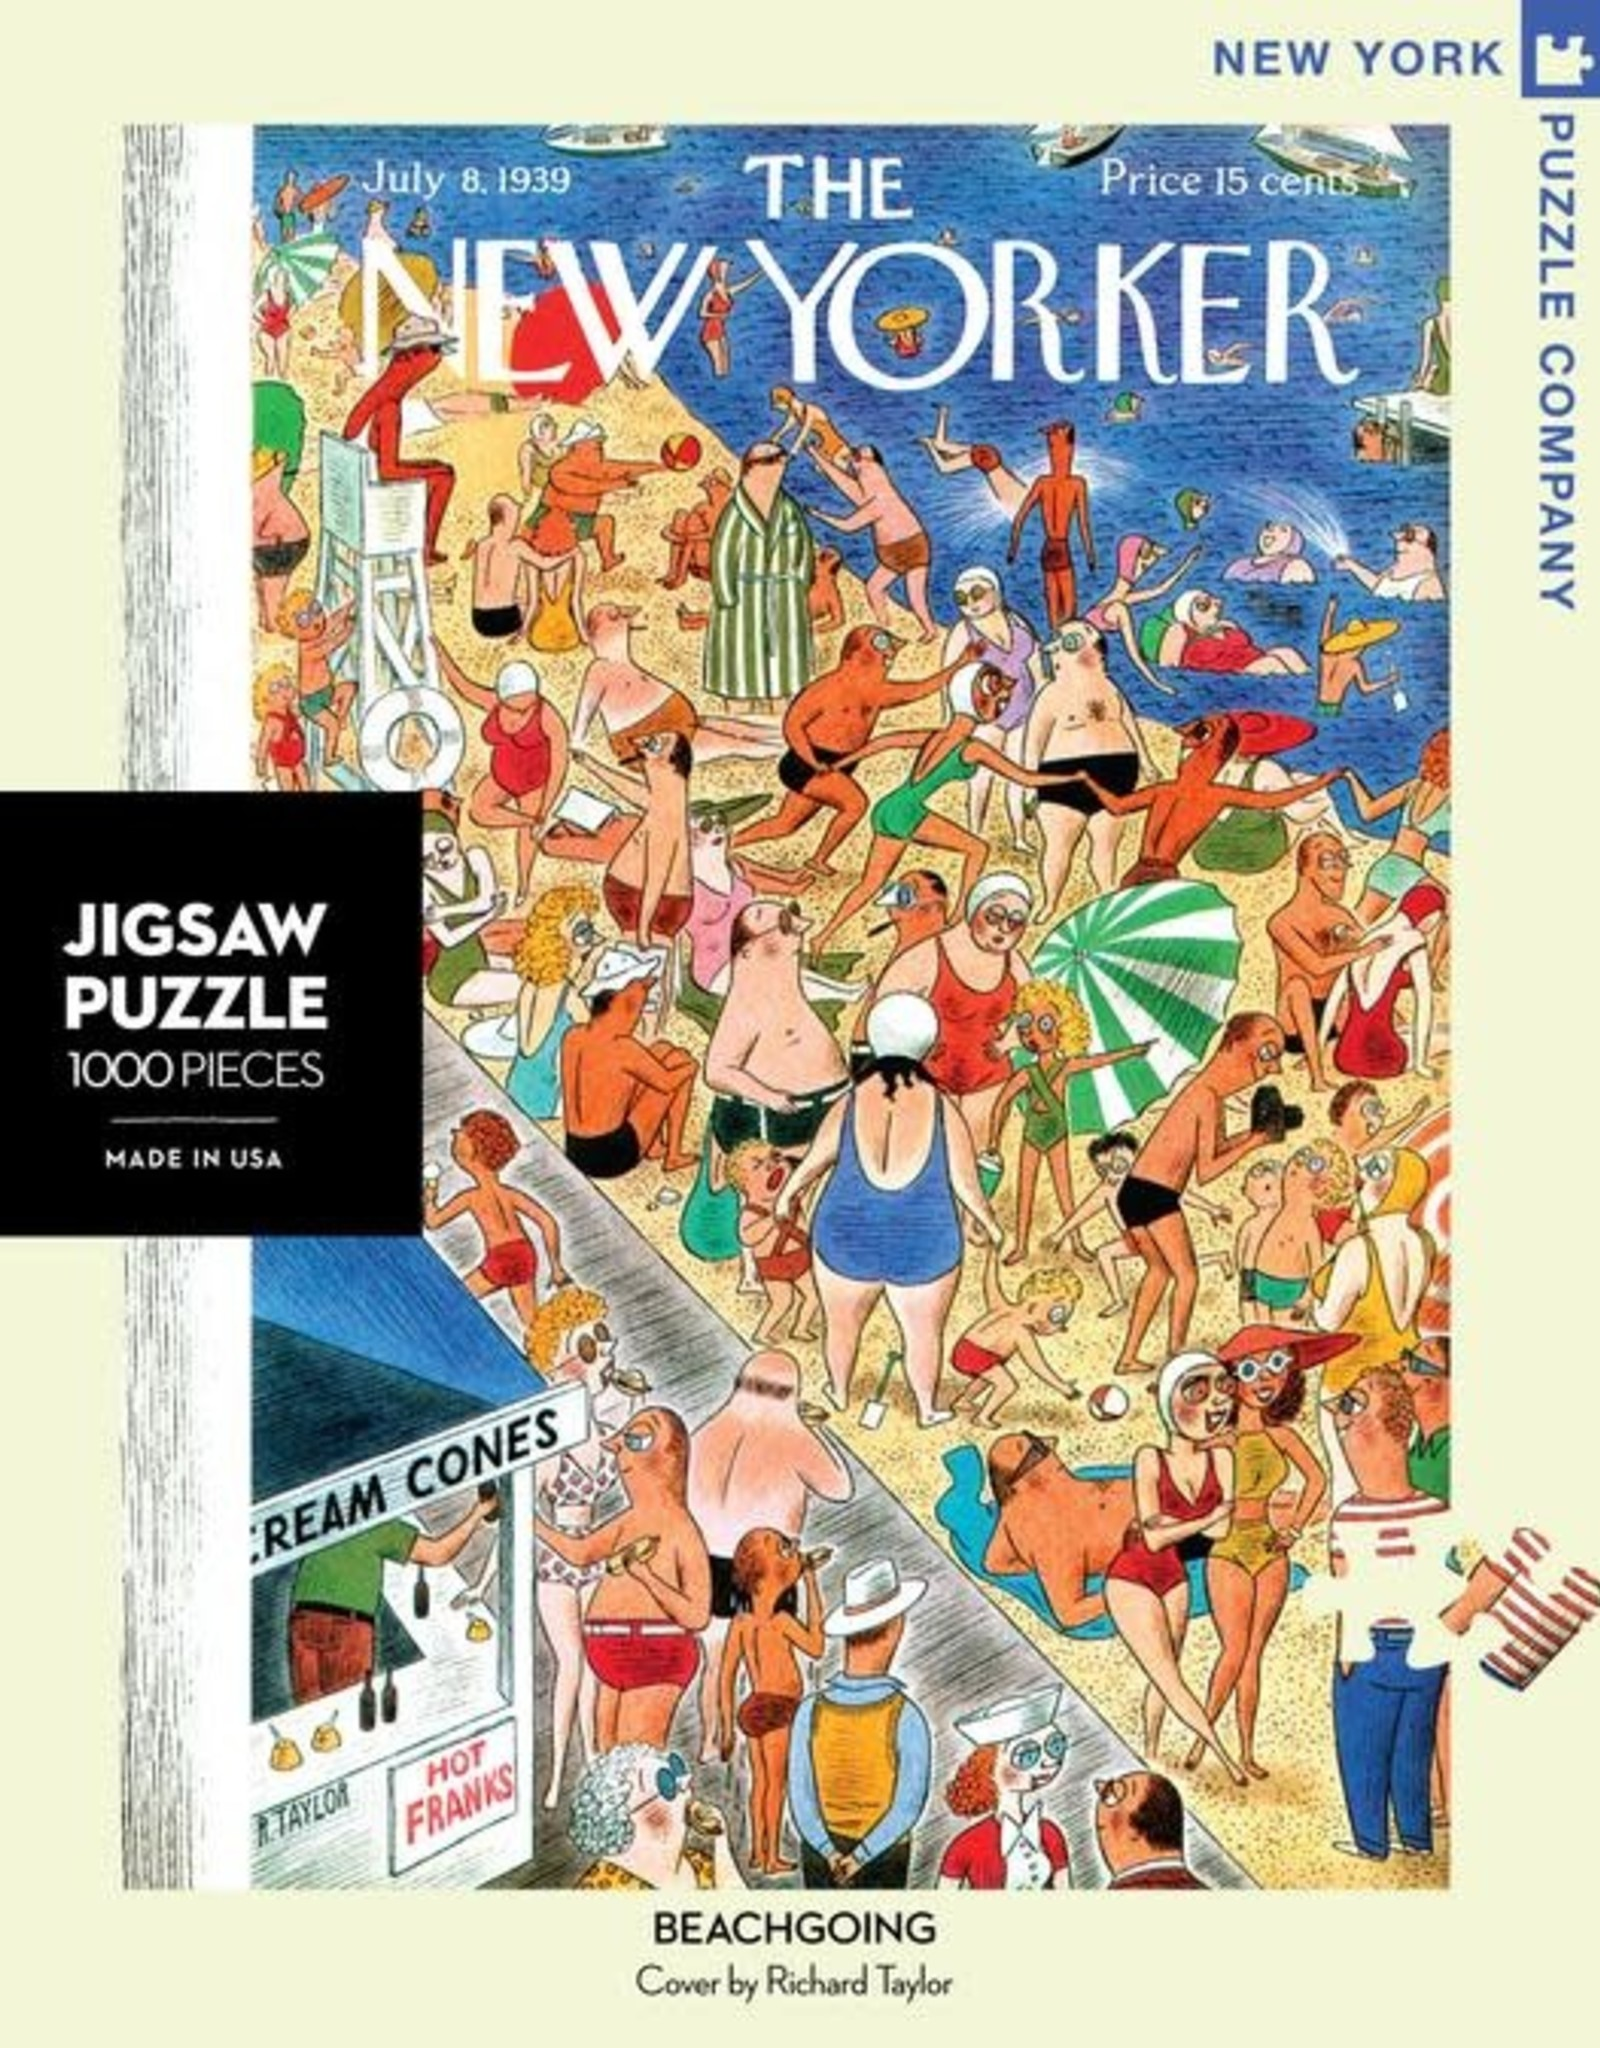 Beachgoing Puzzle, 1000 Pieces